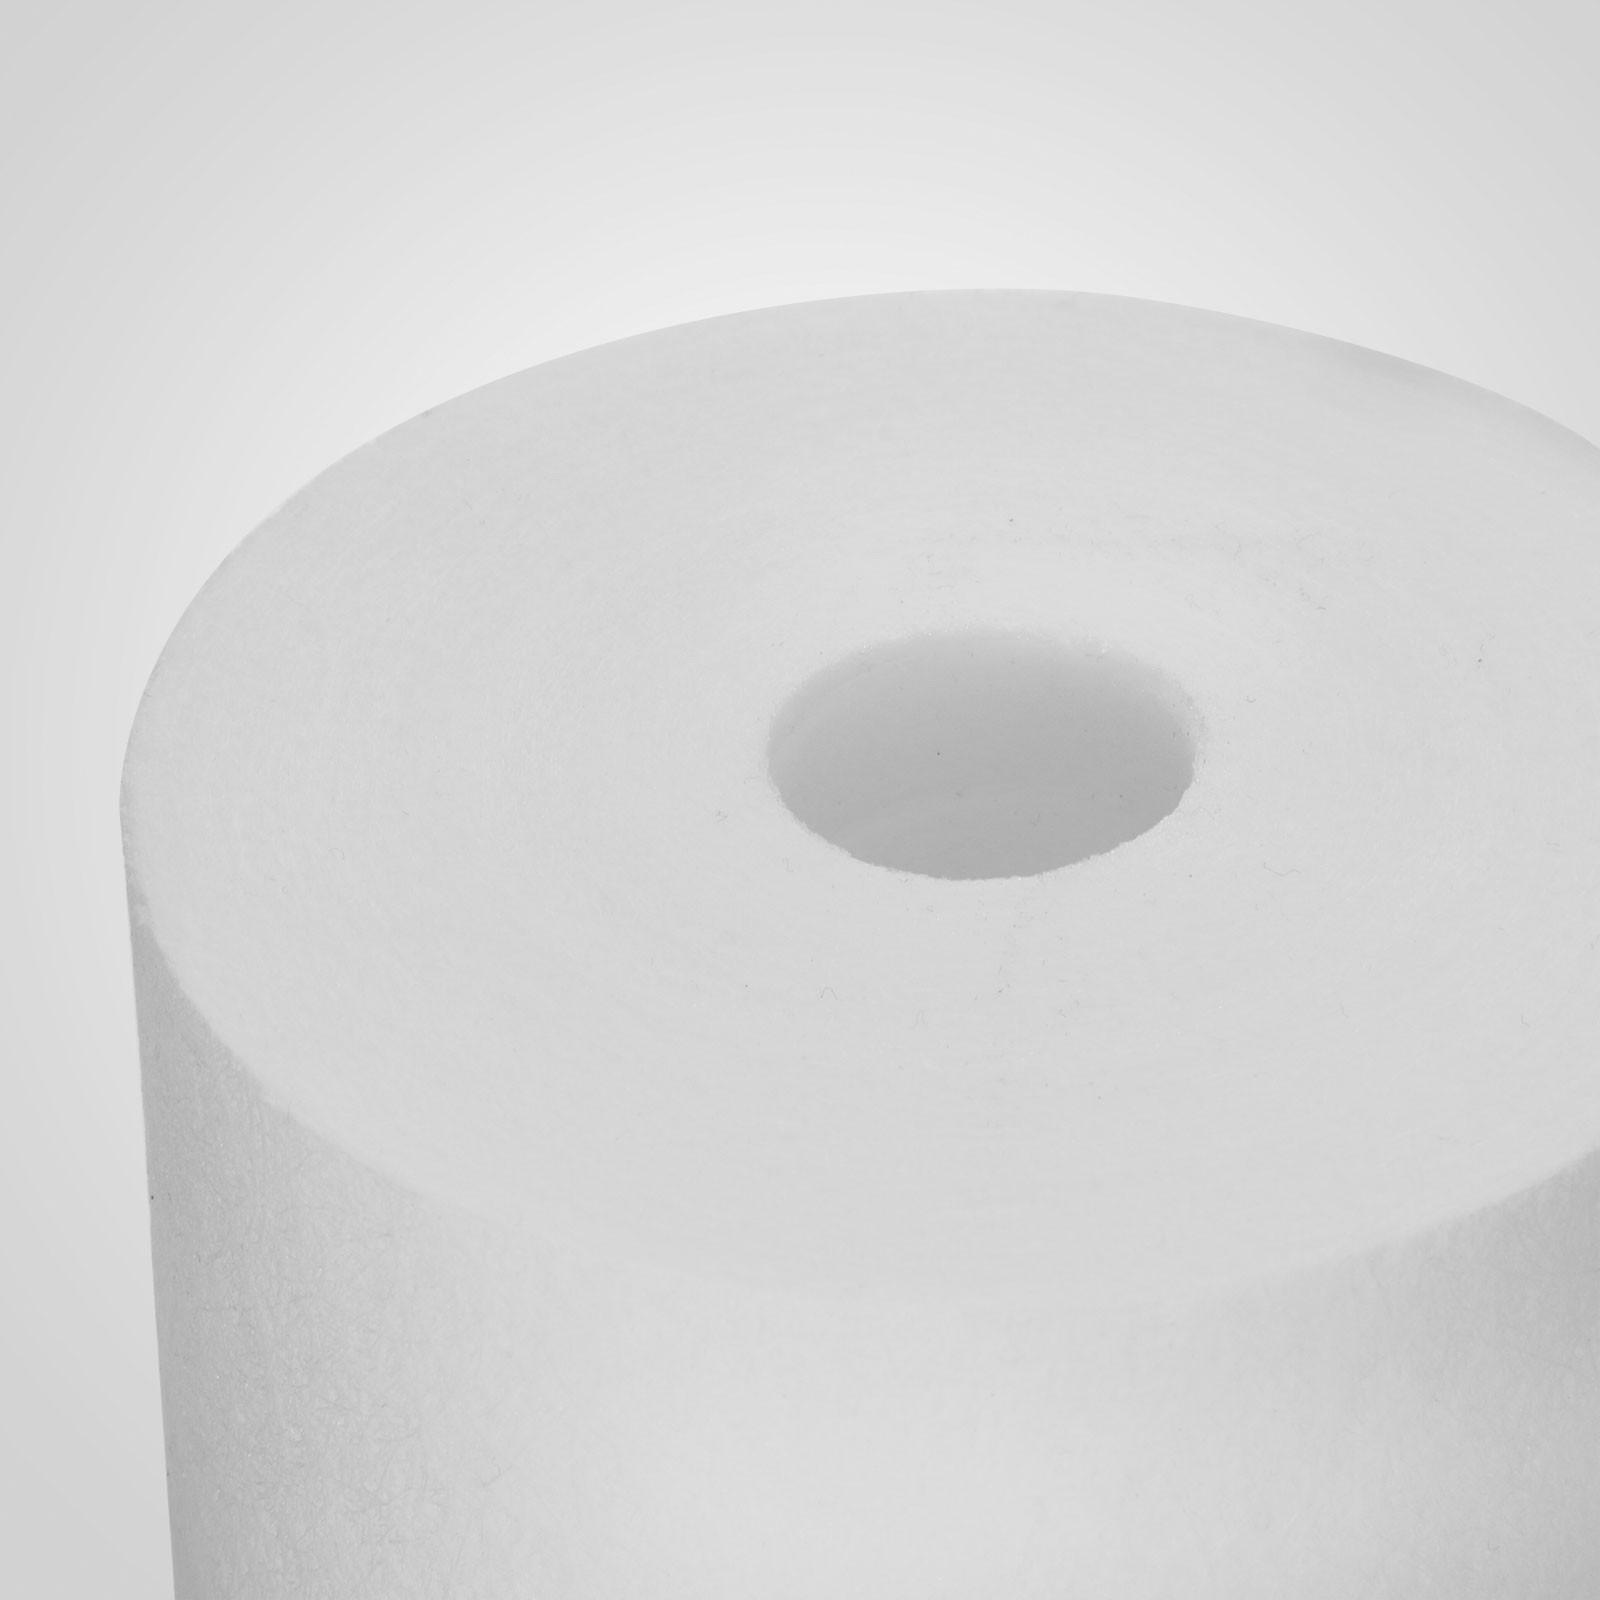 20Pcs-Cartouche-Filtrante-5-Micron-10-034-X-4-5-034-as-Brita-Emballe-Individu-Bobine miniature 12